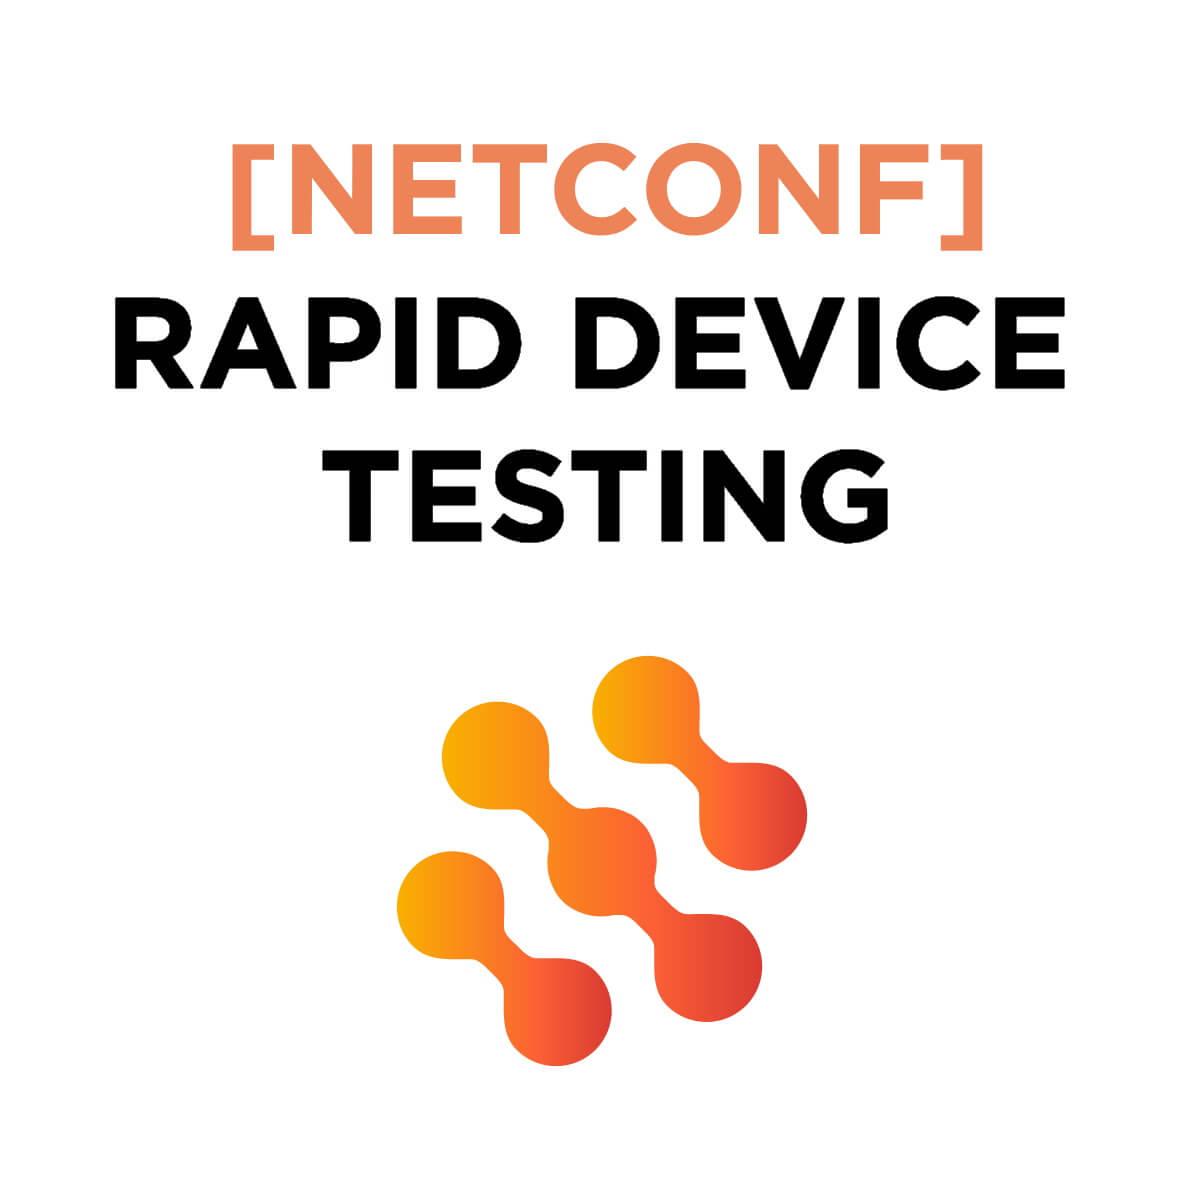 netconf_testing_lighty